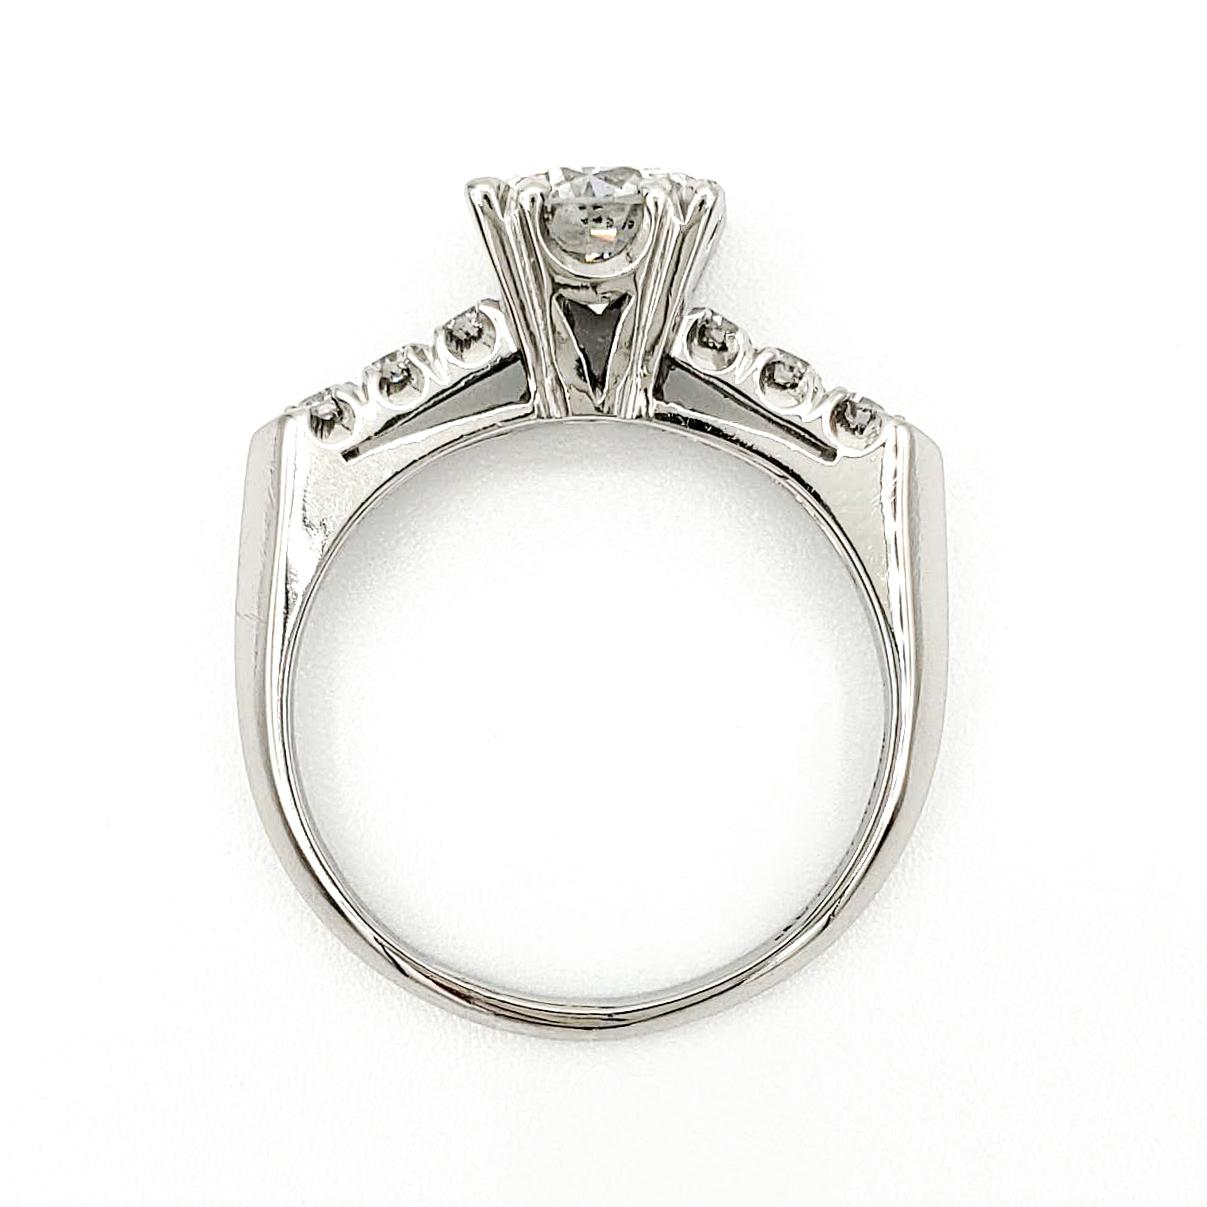 vintage-platinum-engagement-ring-with-1-01-carat-round-brilliant-cut-diamond-egl-g-si1